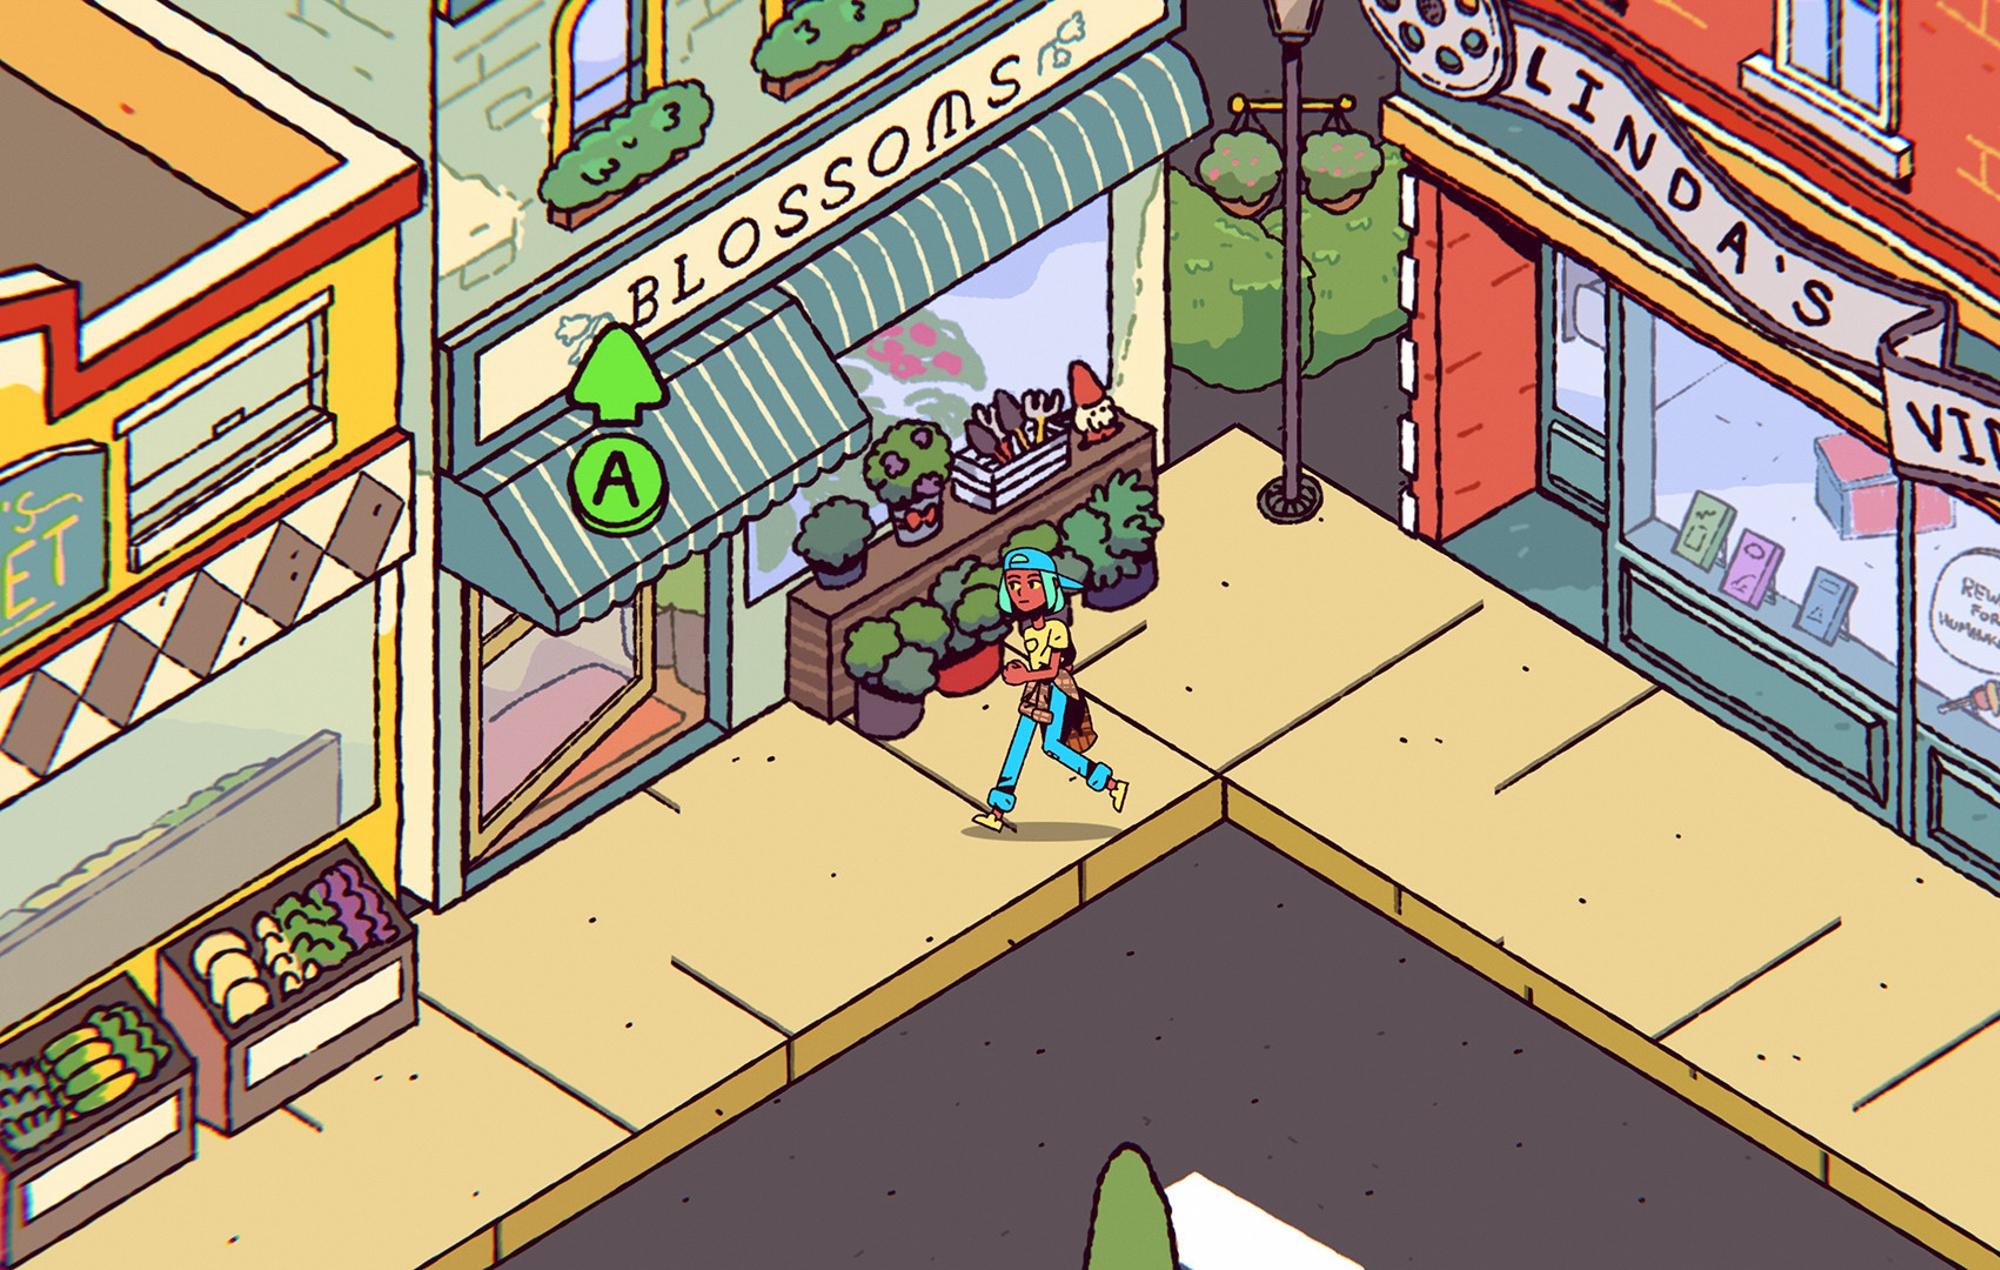 The Big Con shops